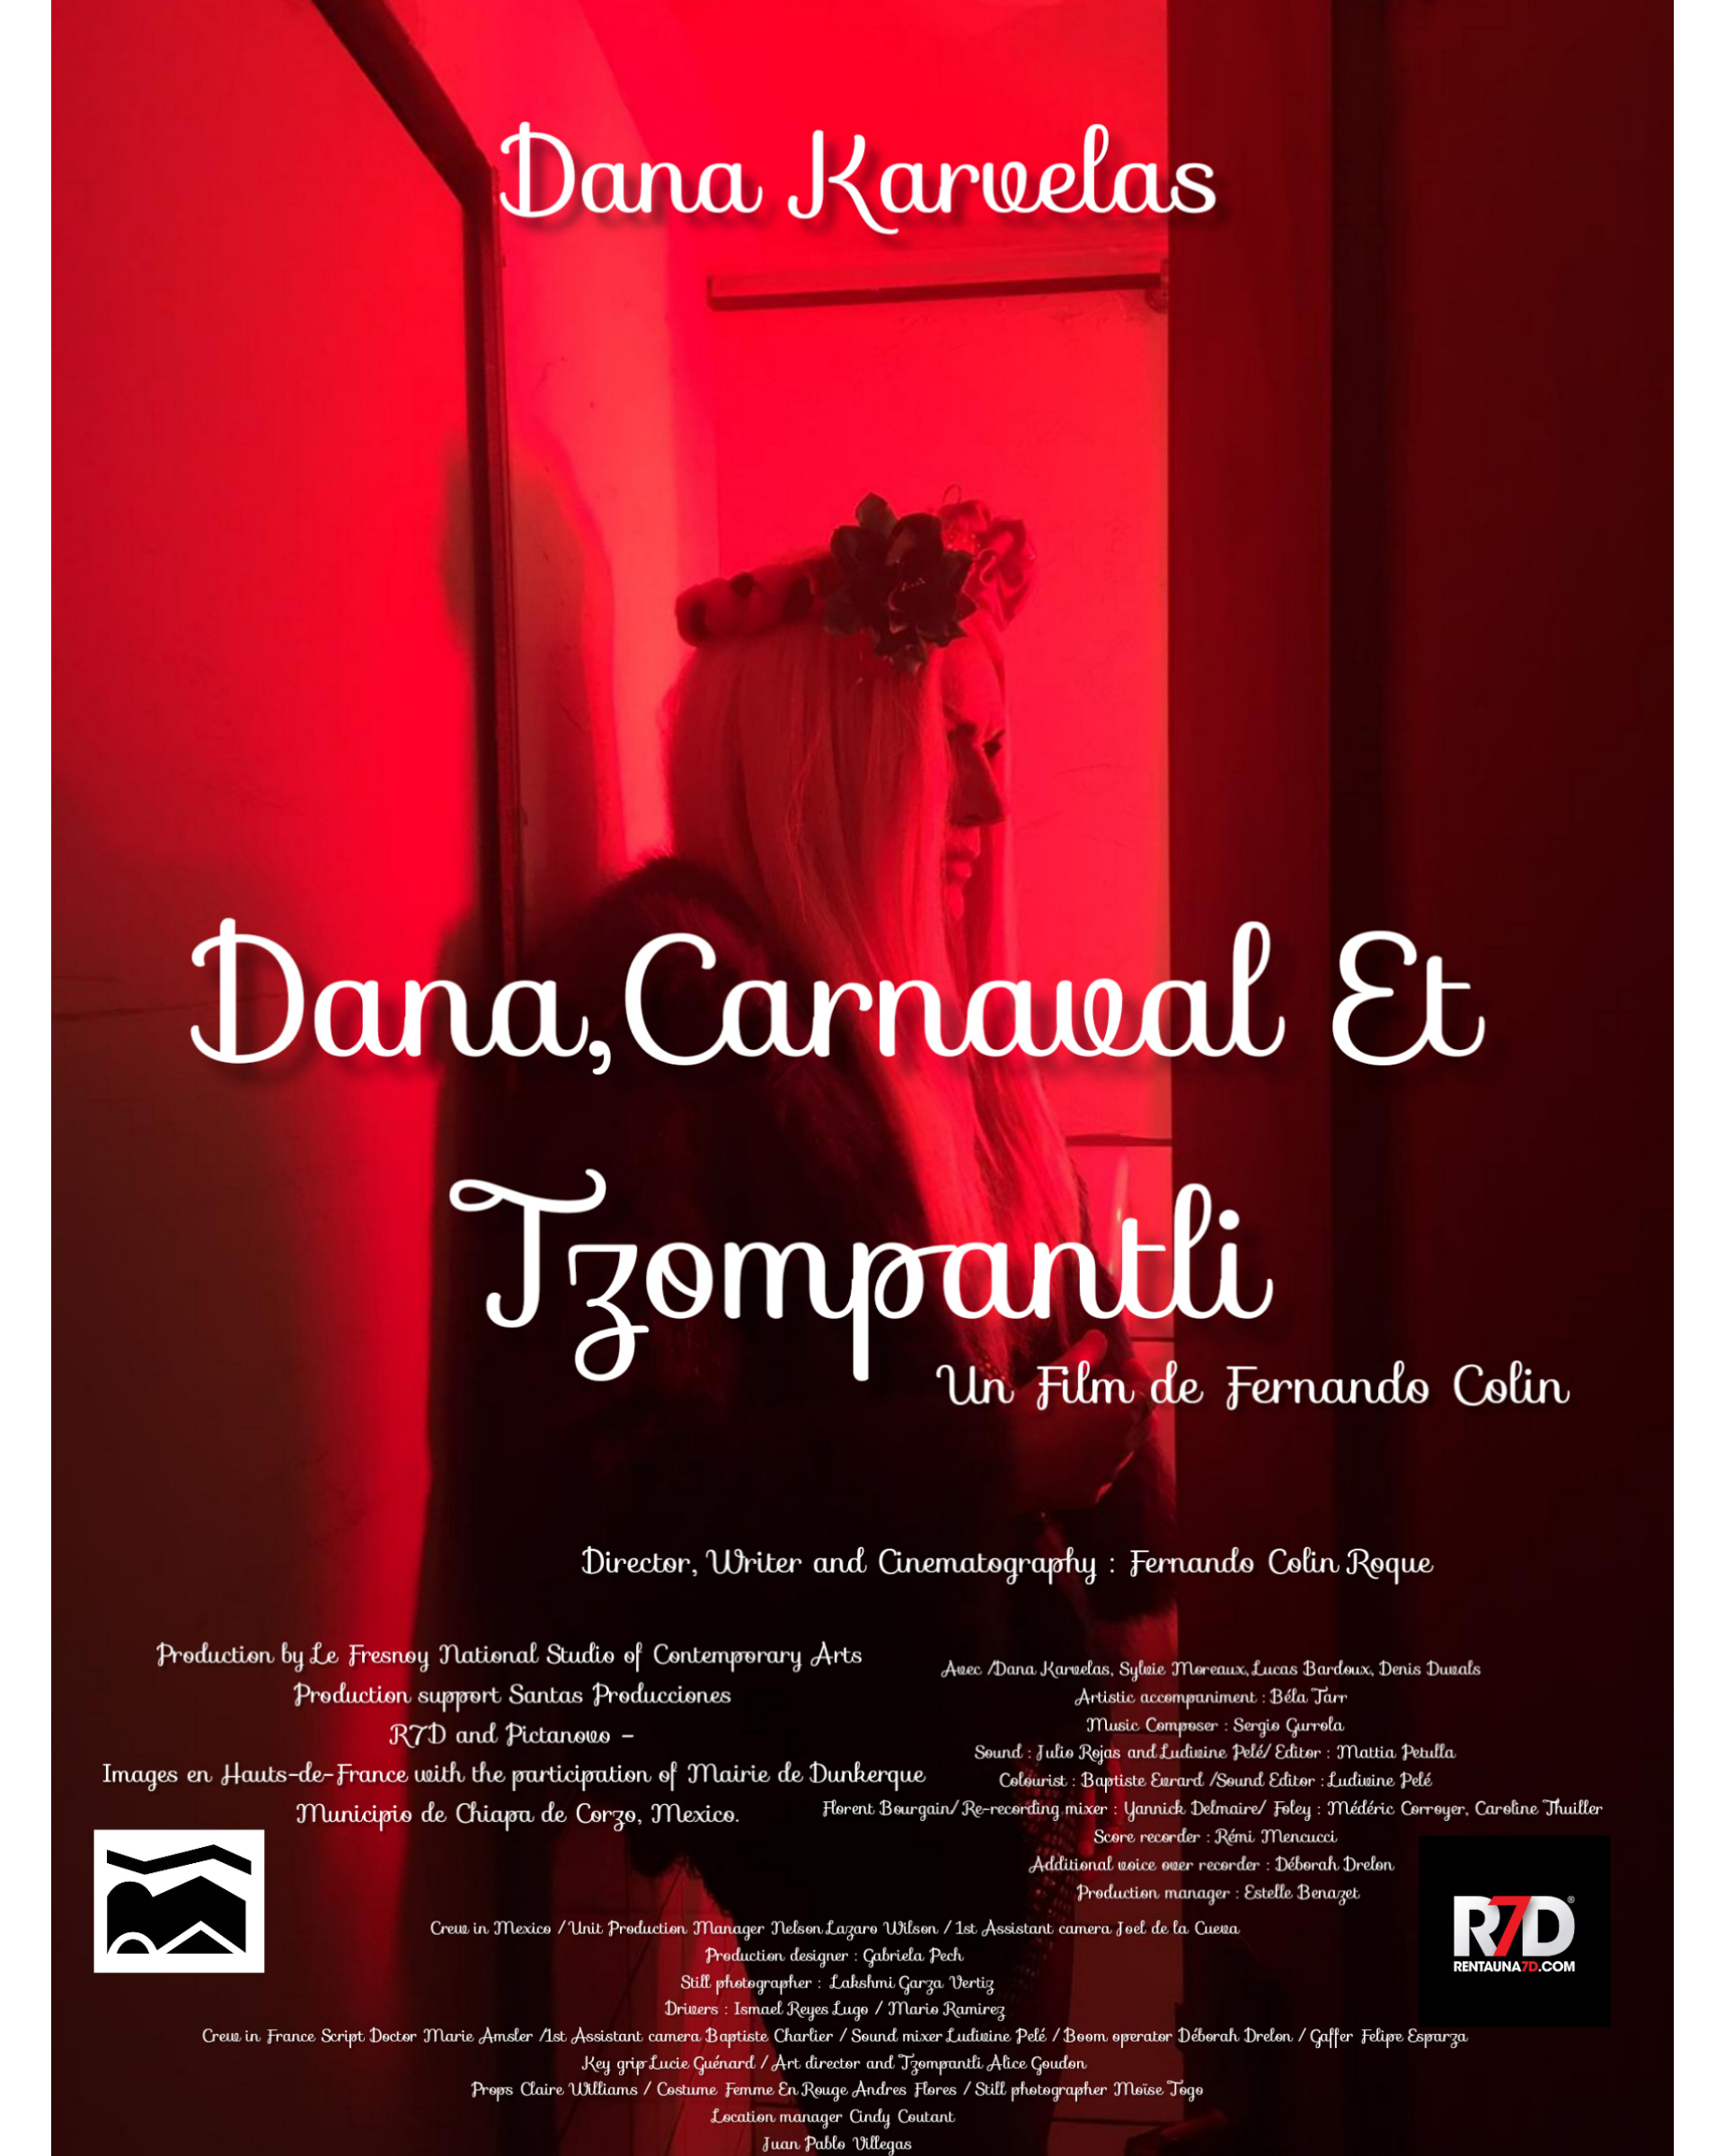 Dana, Carnaval y Tzompantli (2019)